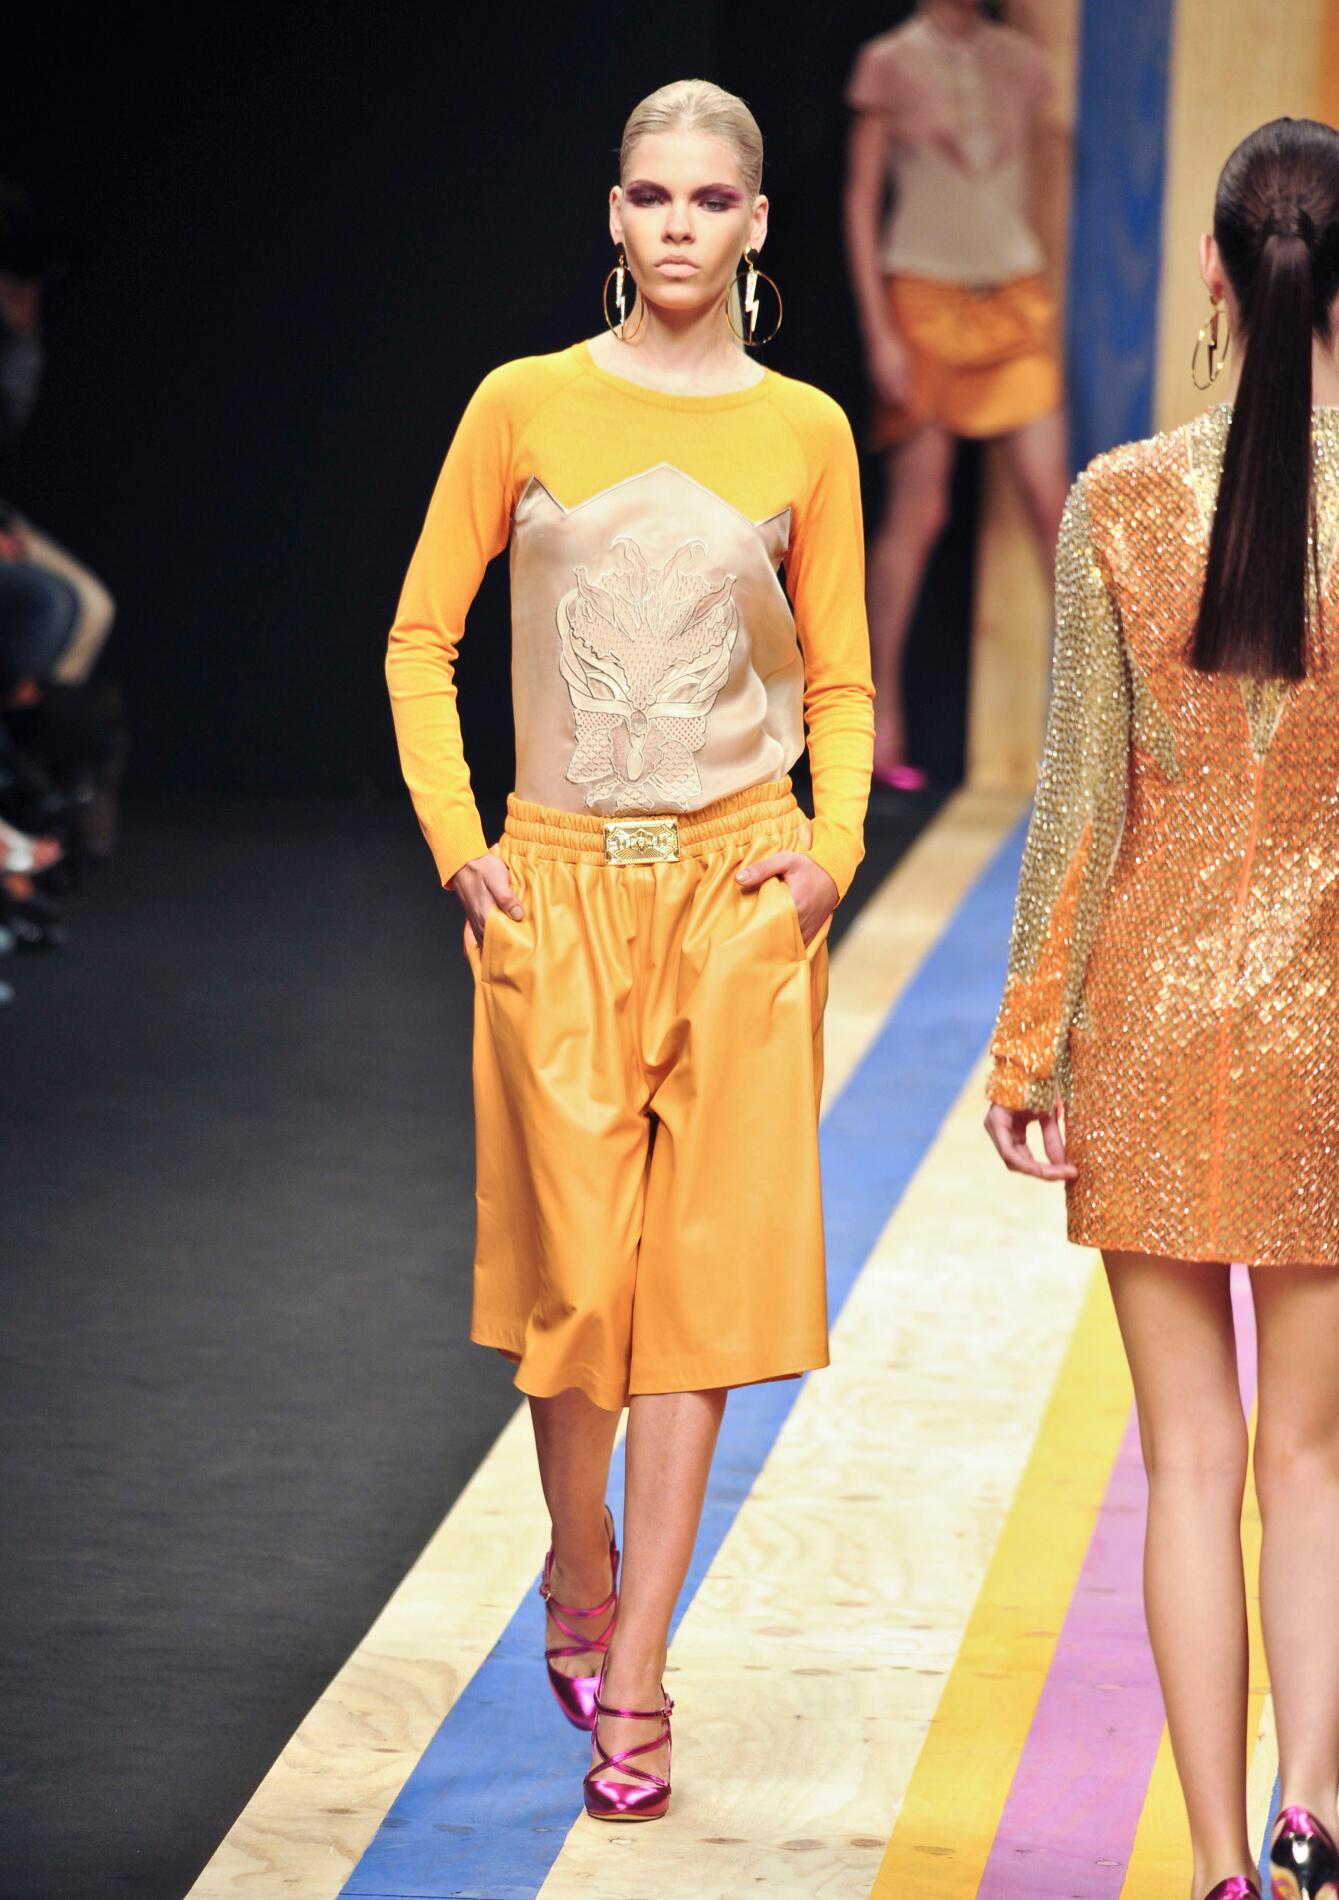 Spring Color Dress Fashion Woman Orange